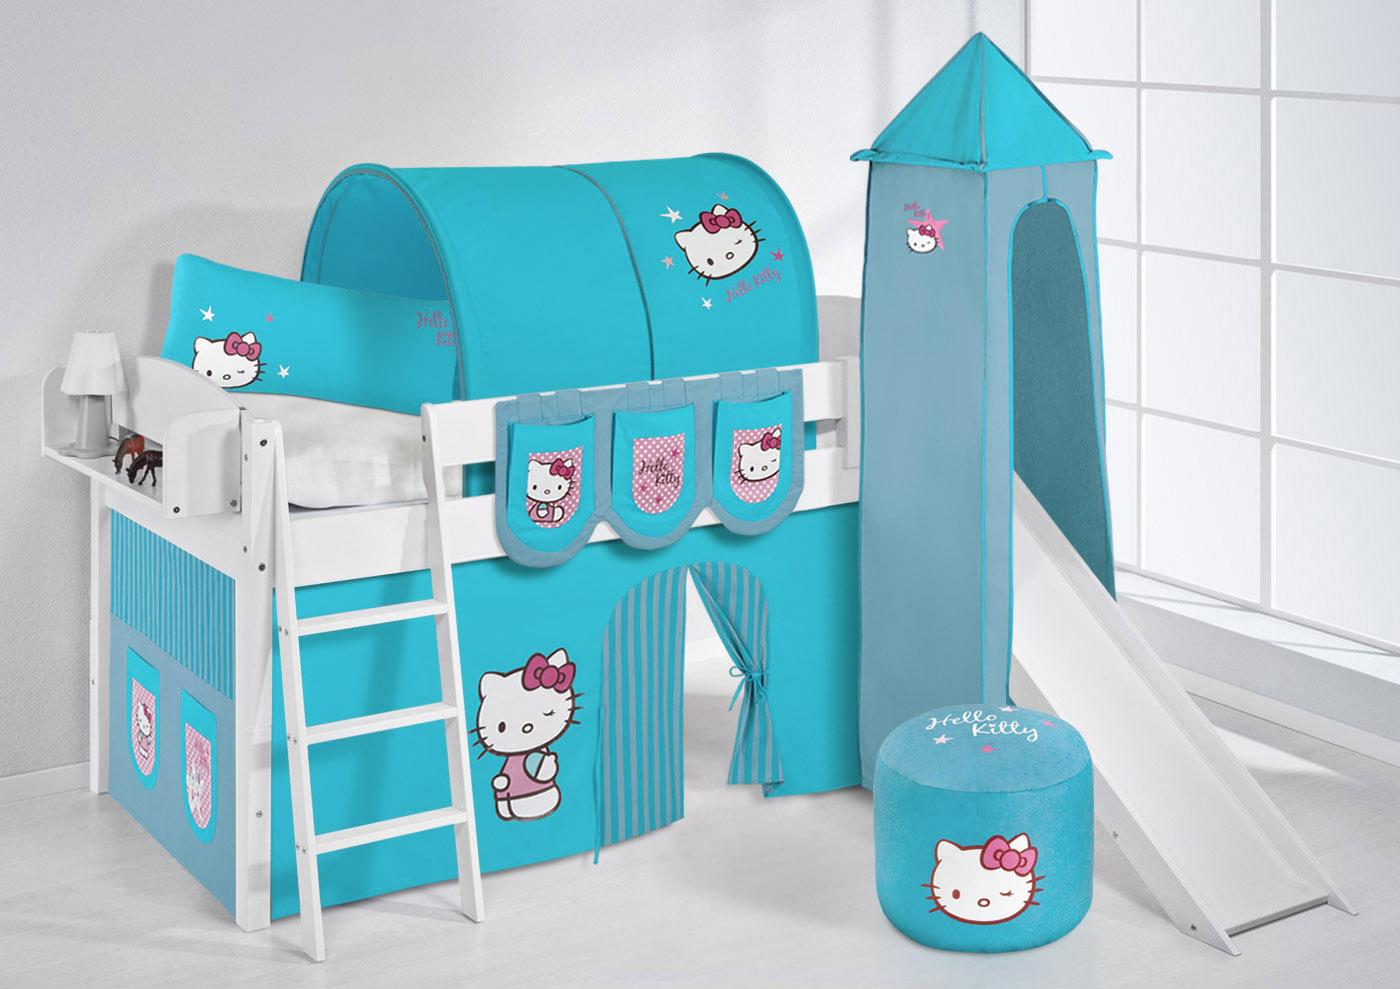 spielbett hochbett kinderbett kinder bett mit turm und. Black Bedroom Furniture Sets. Home Design Ideas